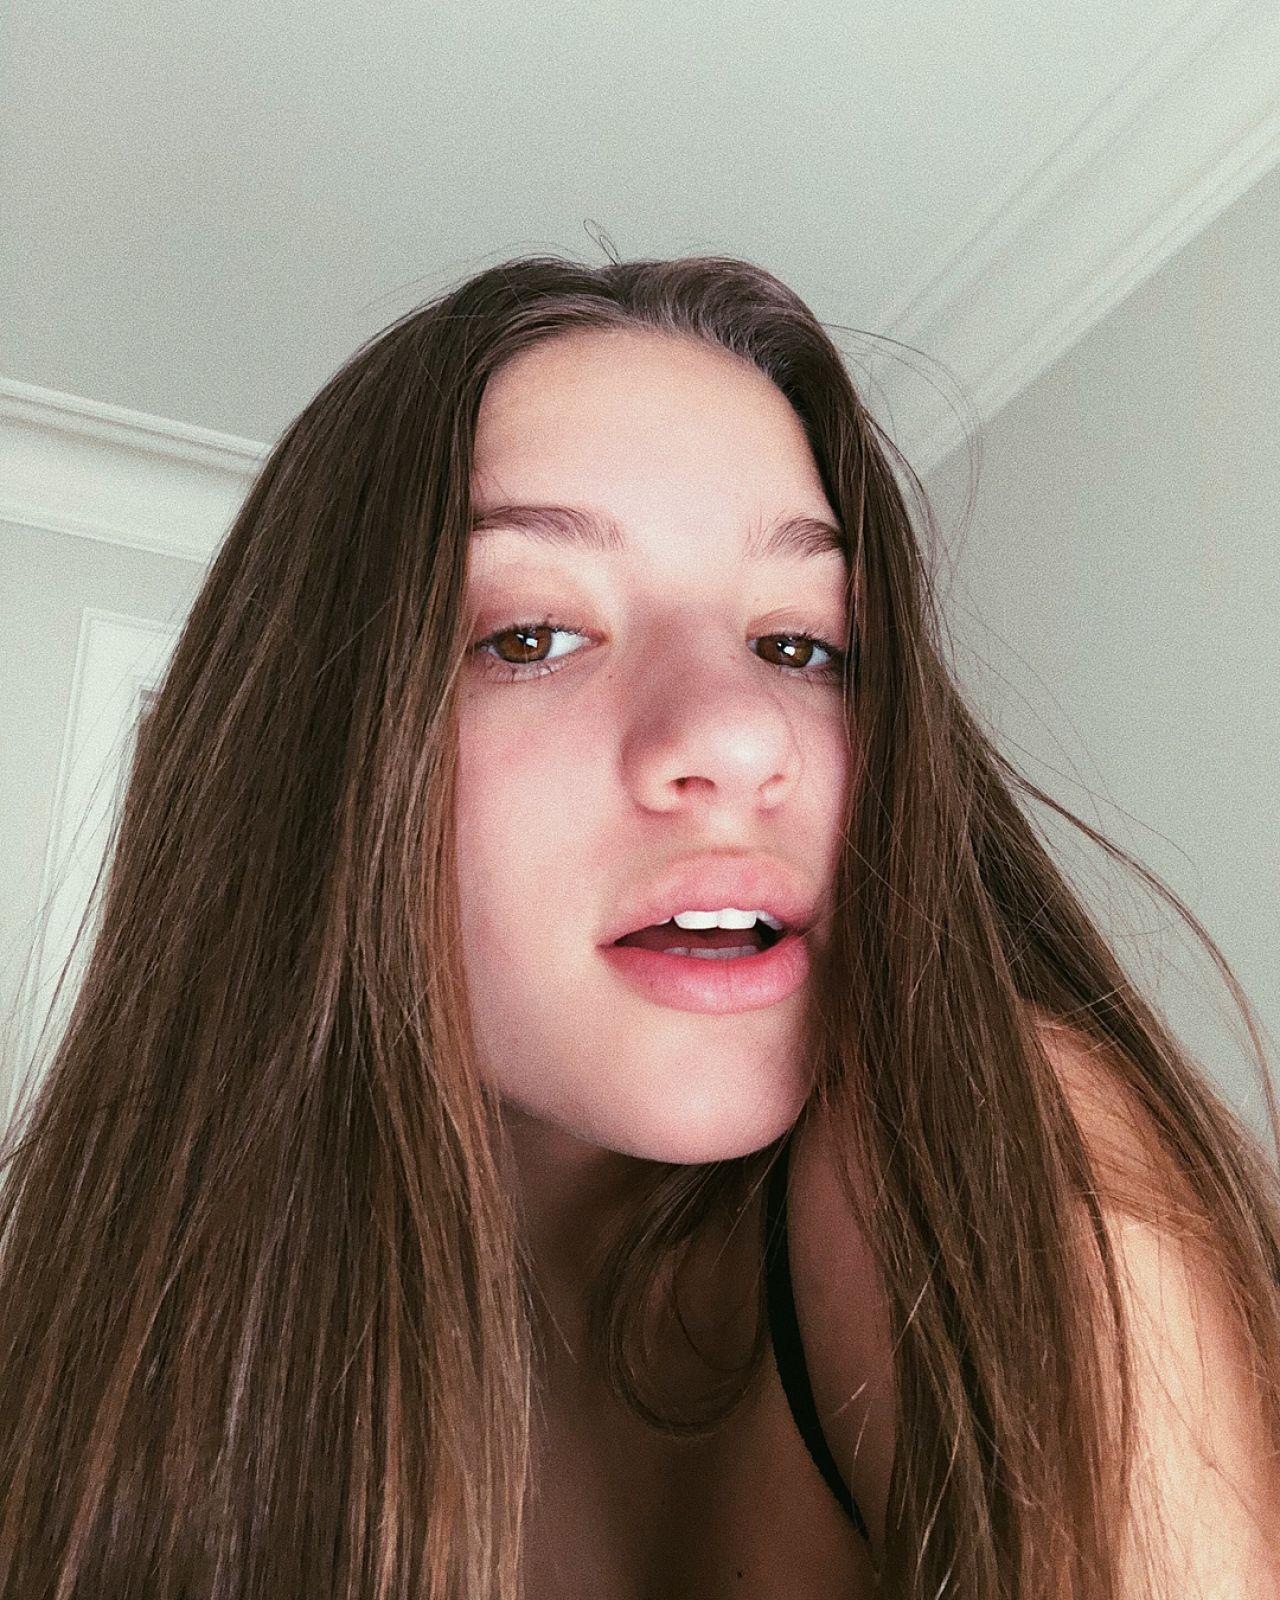 Mackenzie Ziegler Social Media 02 09 2018